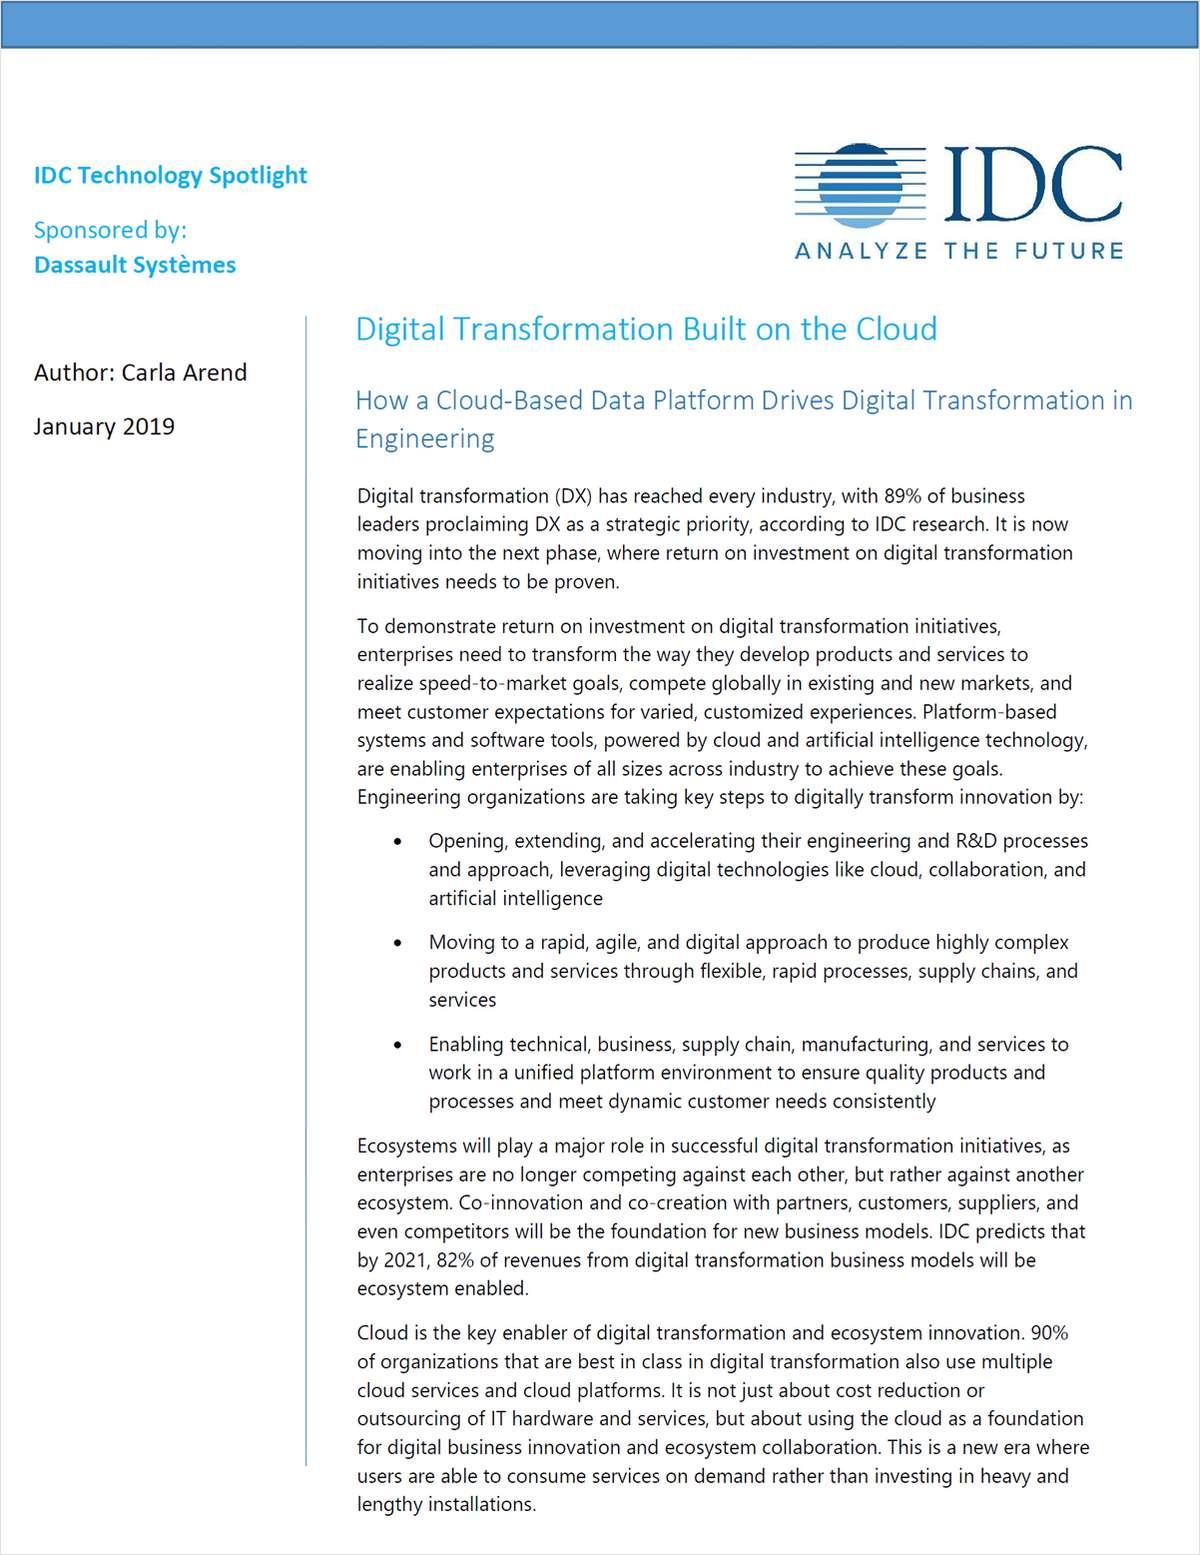 Digital Transformation Built on the Cloud